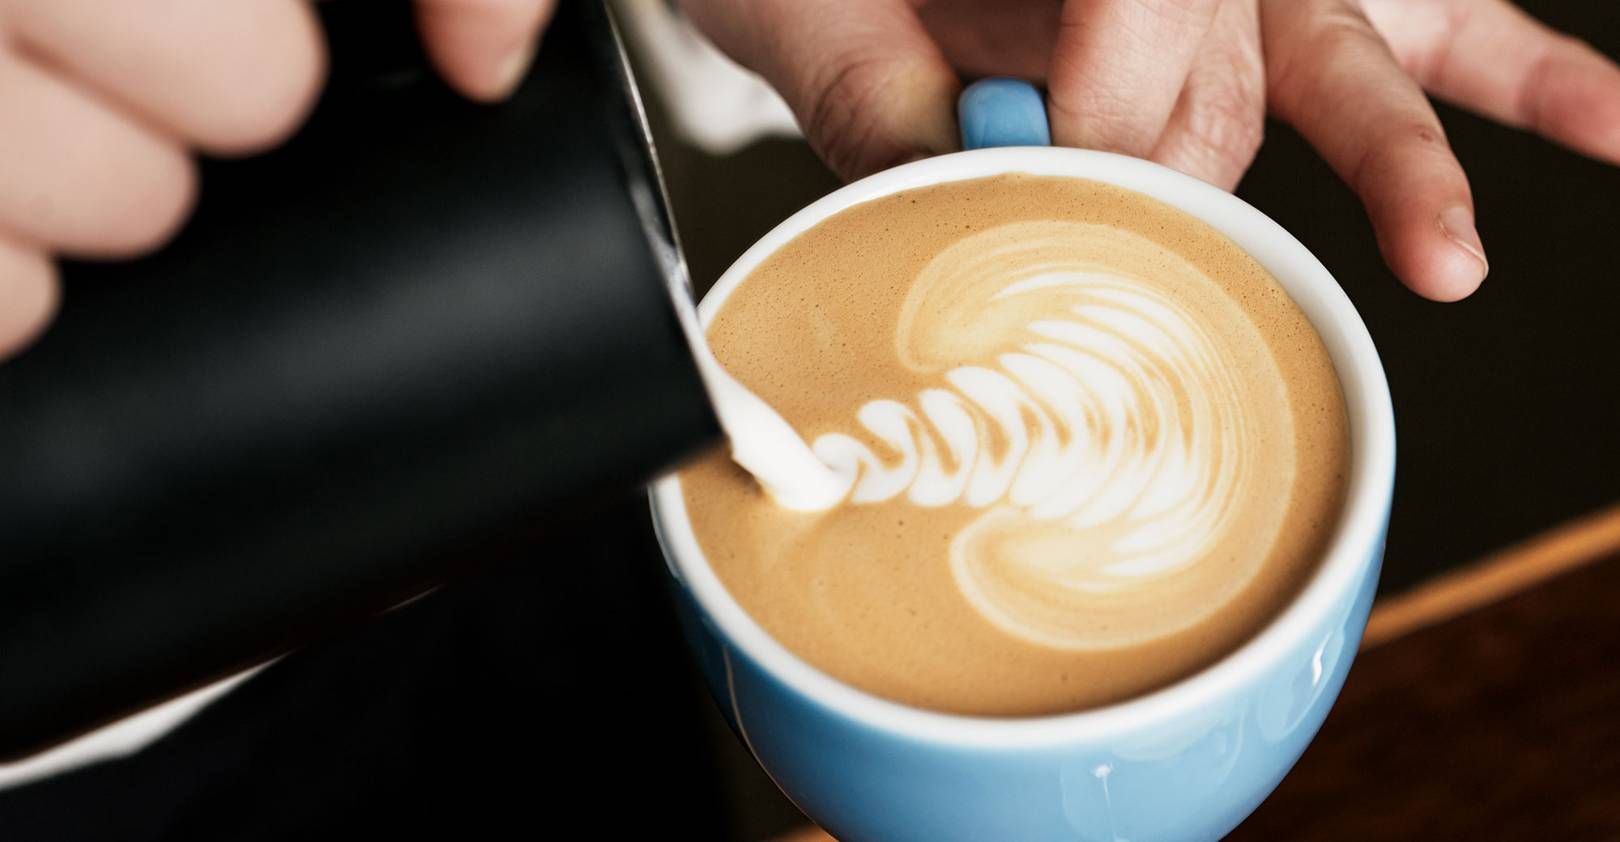 The 18 best coffee shops in London